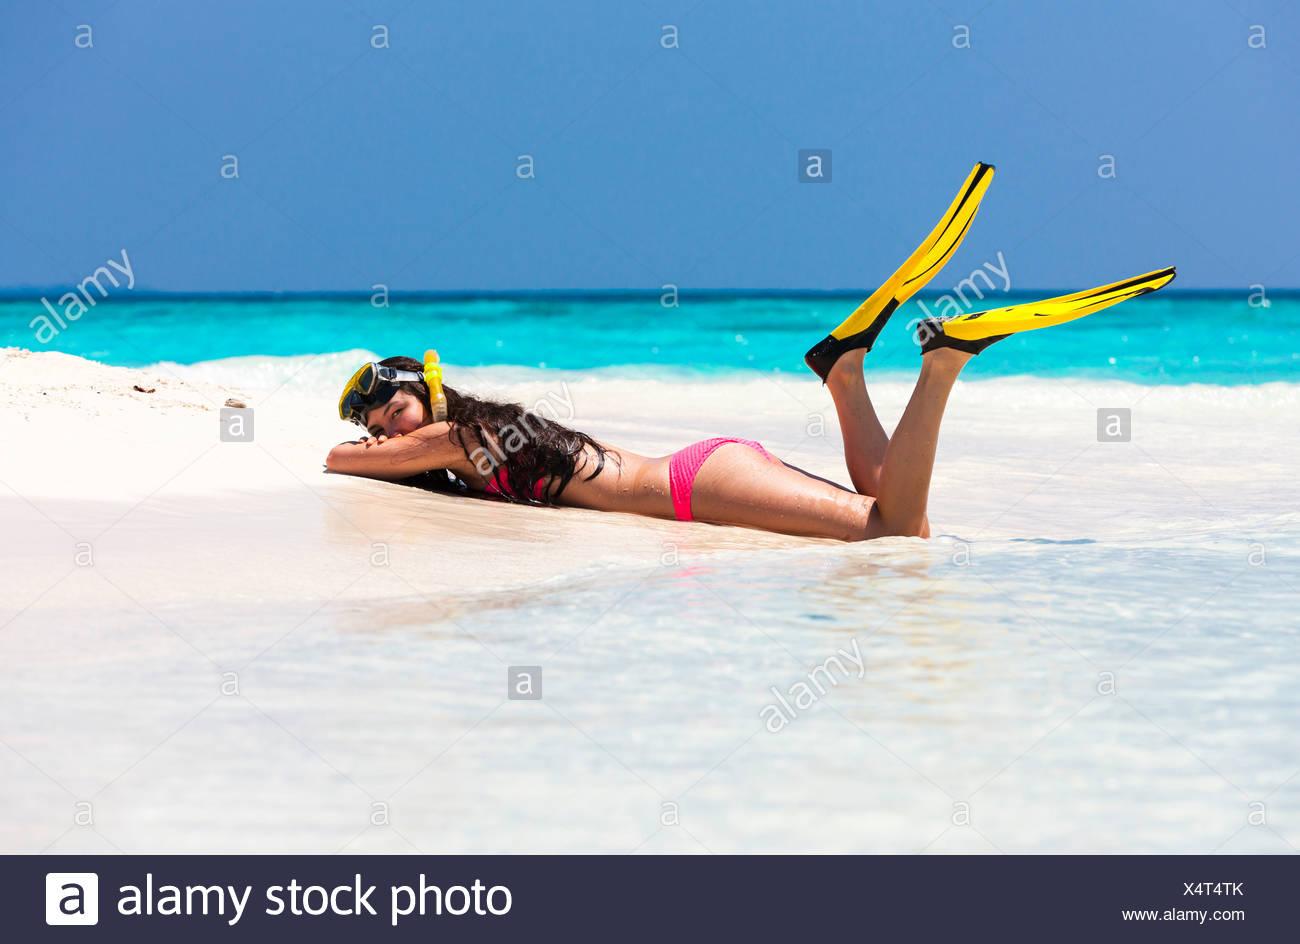 Beach woman lying on Truck drives